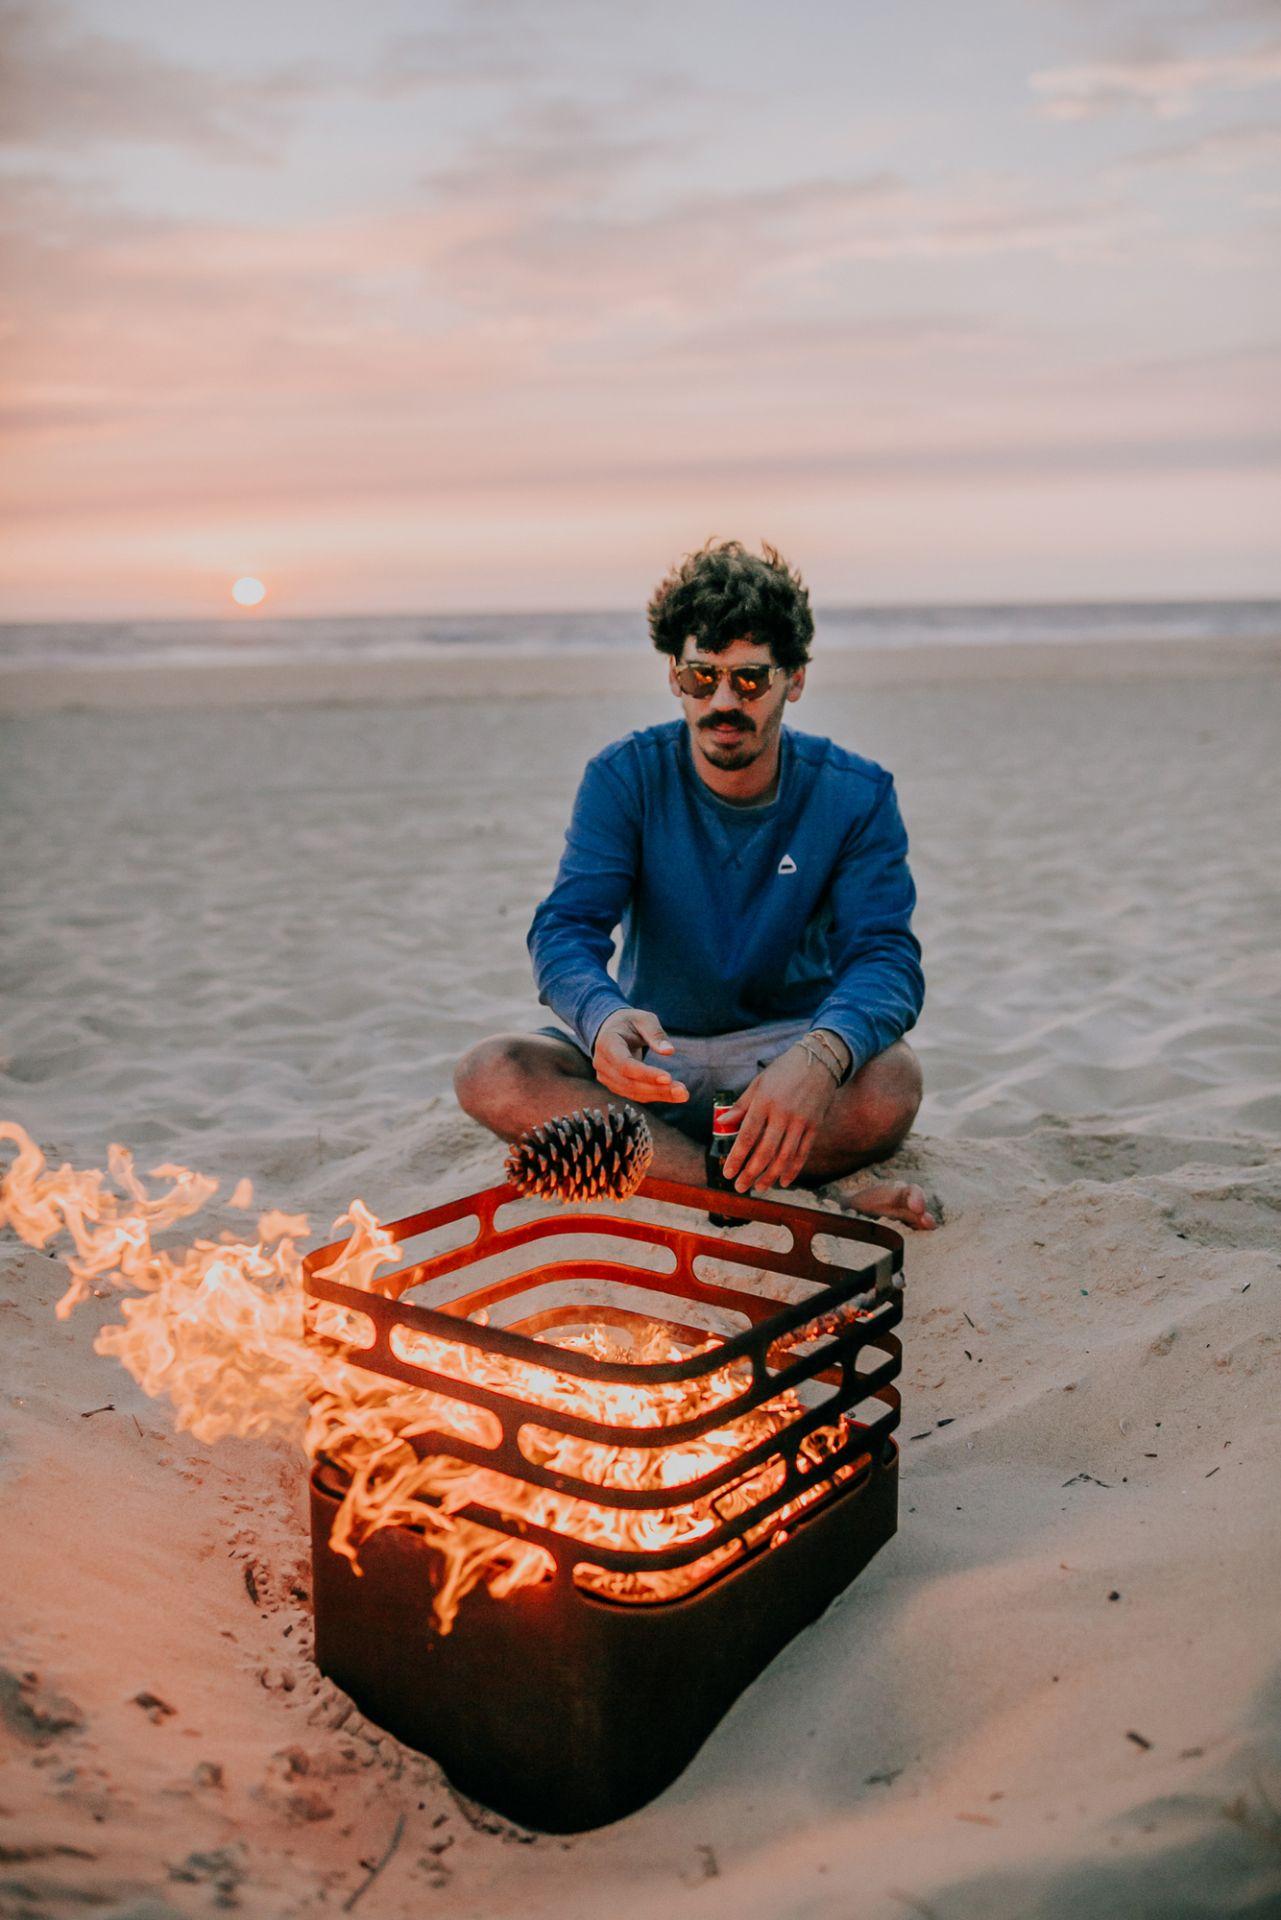 Cube Feuerkorb rostig höfats